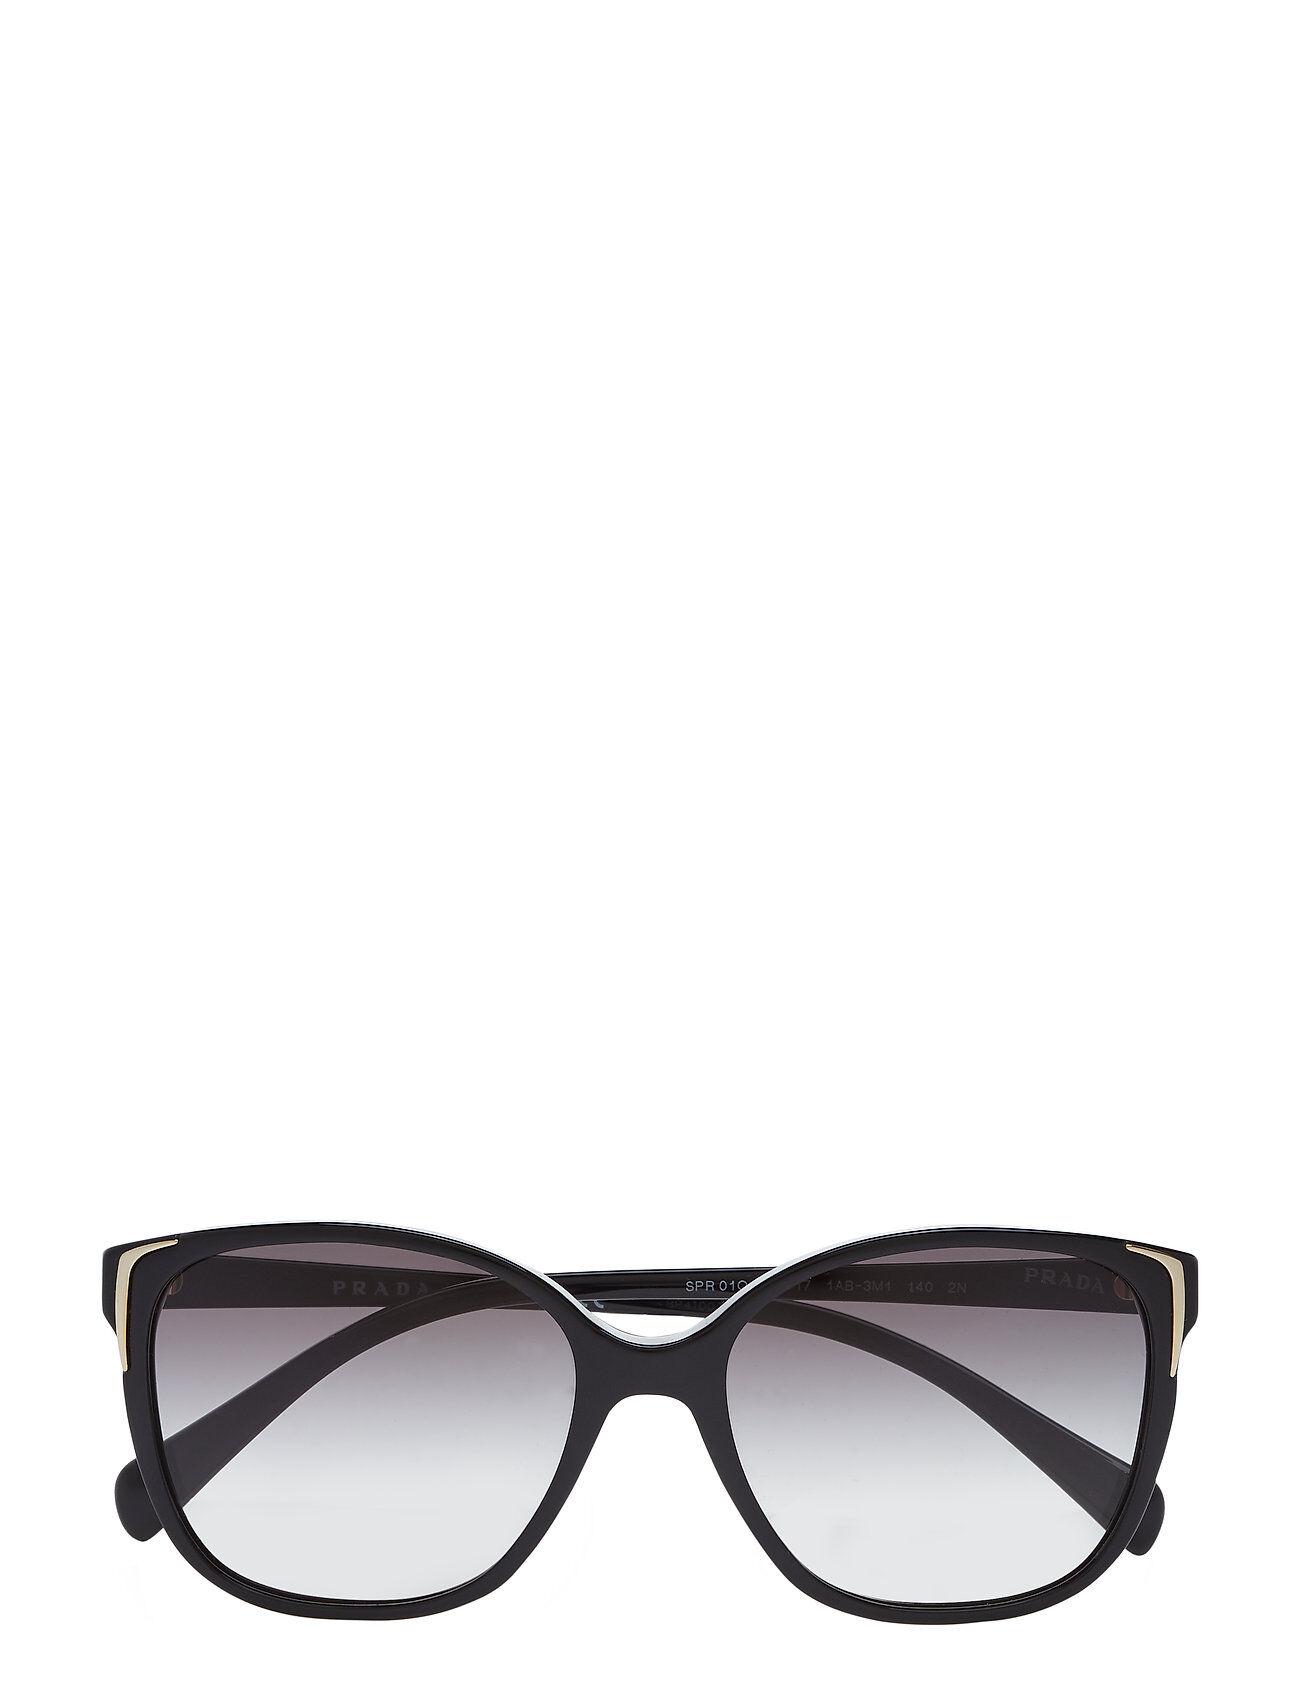 Image of Prada Sunglasses 0pr 01os Wayfarer Aurinkolasit Musta